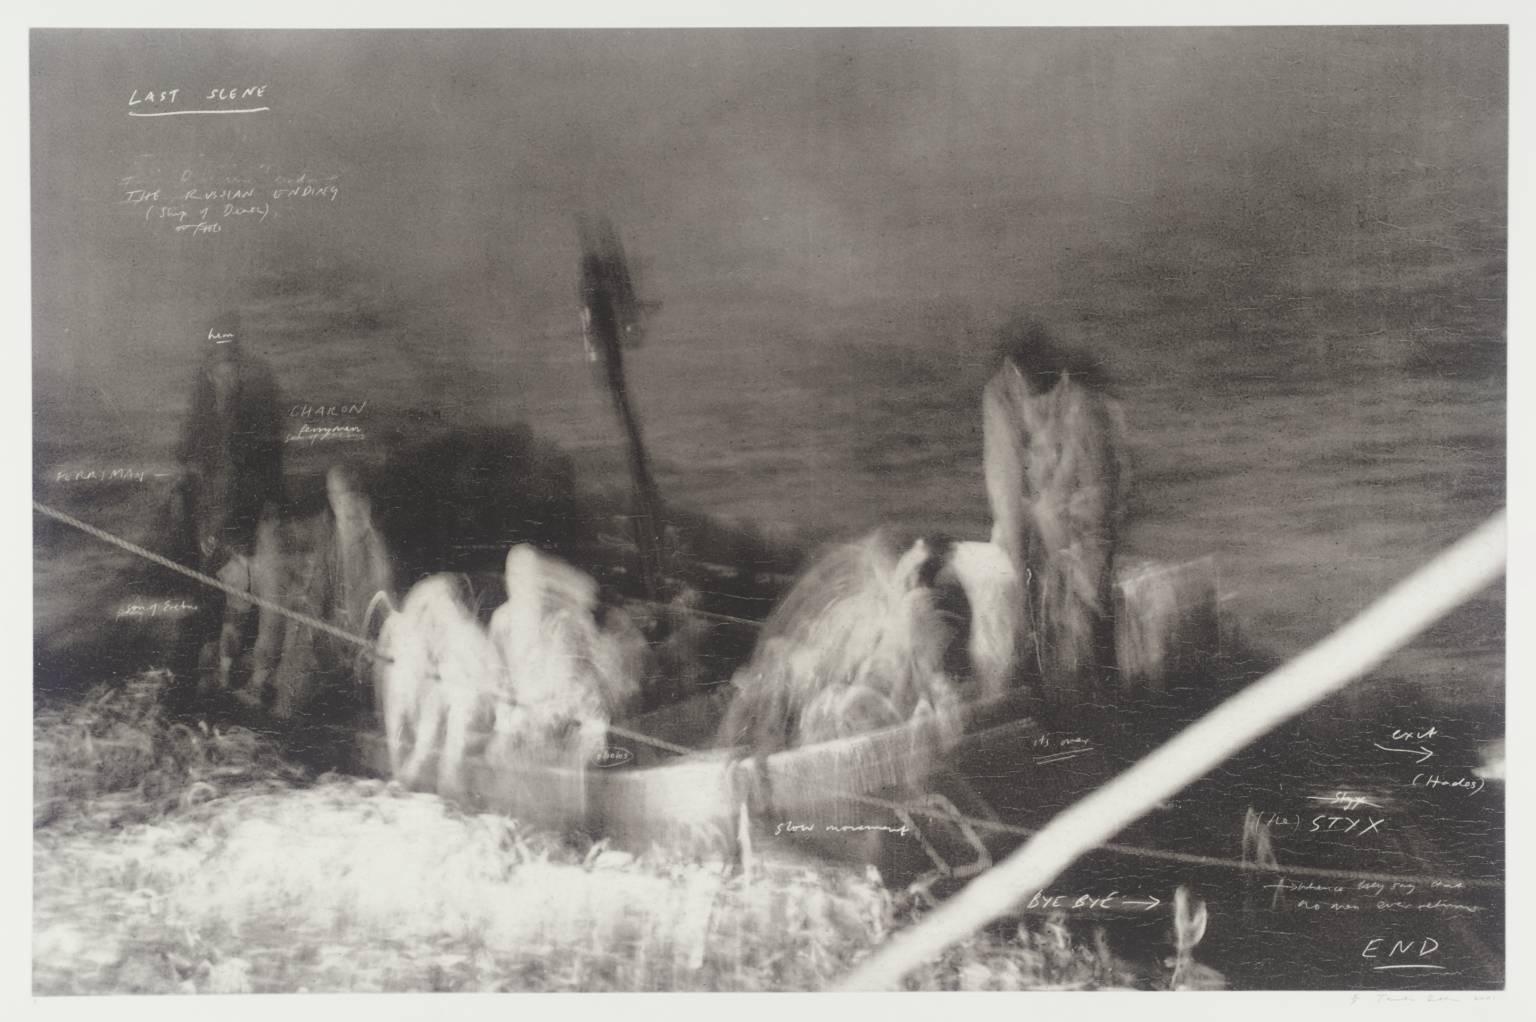 Ship of Death 2001 Tacita Dean born 1965 Presented by the artist 2002 http:/